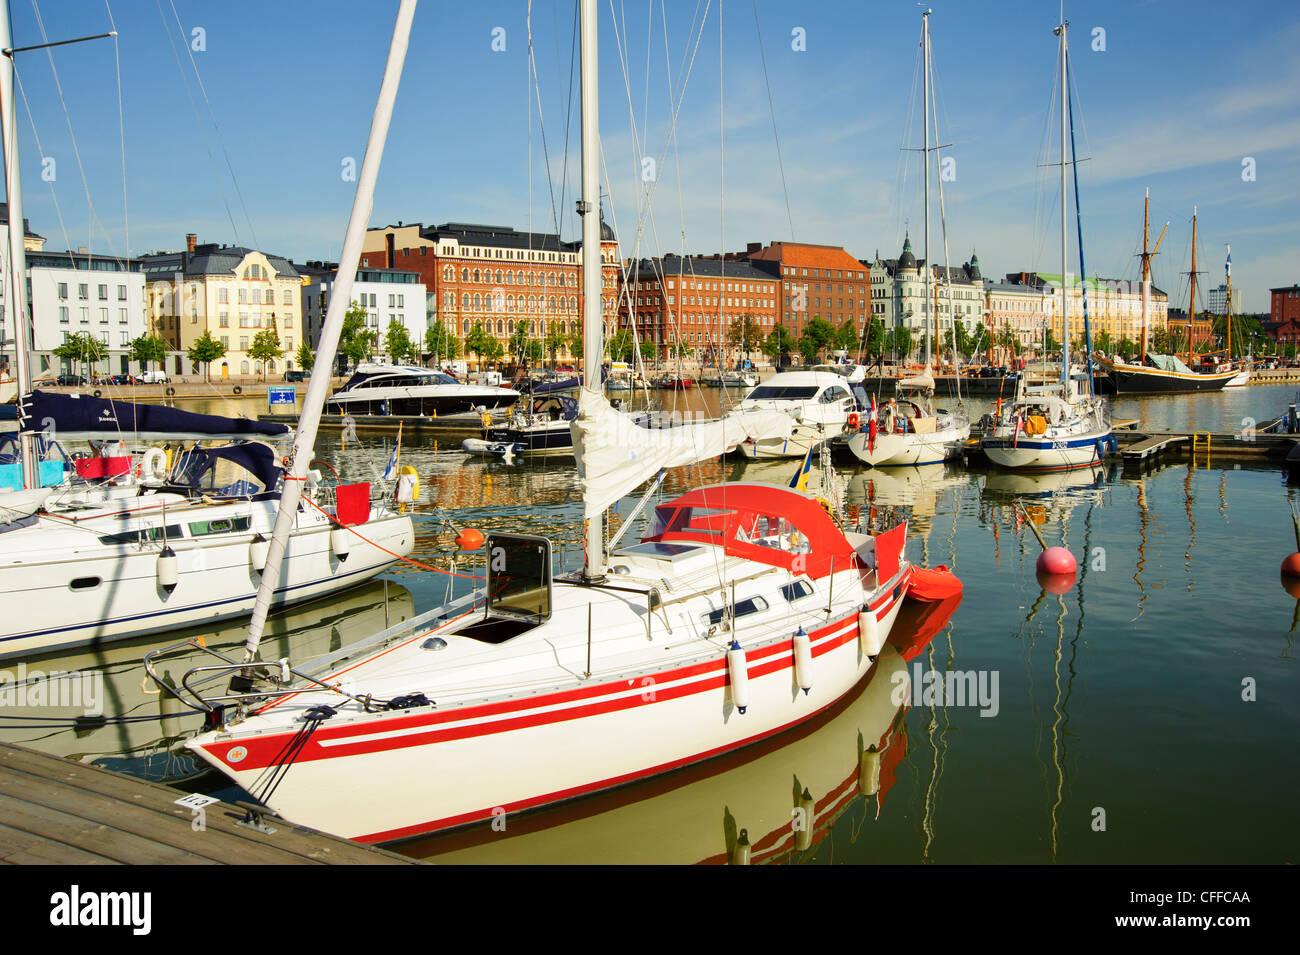 Yachts at Halkolaituri Helsinki Finland with the street frontage of Pohjoisranta behind - Stock Image